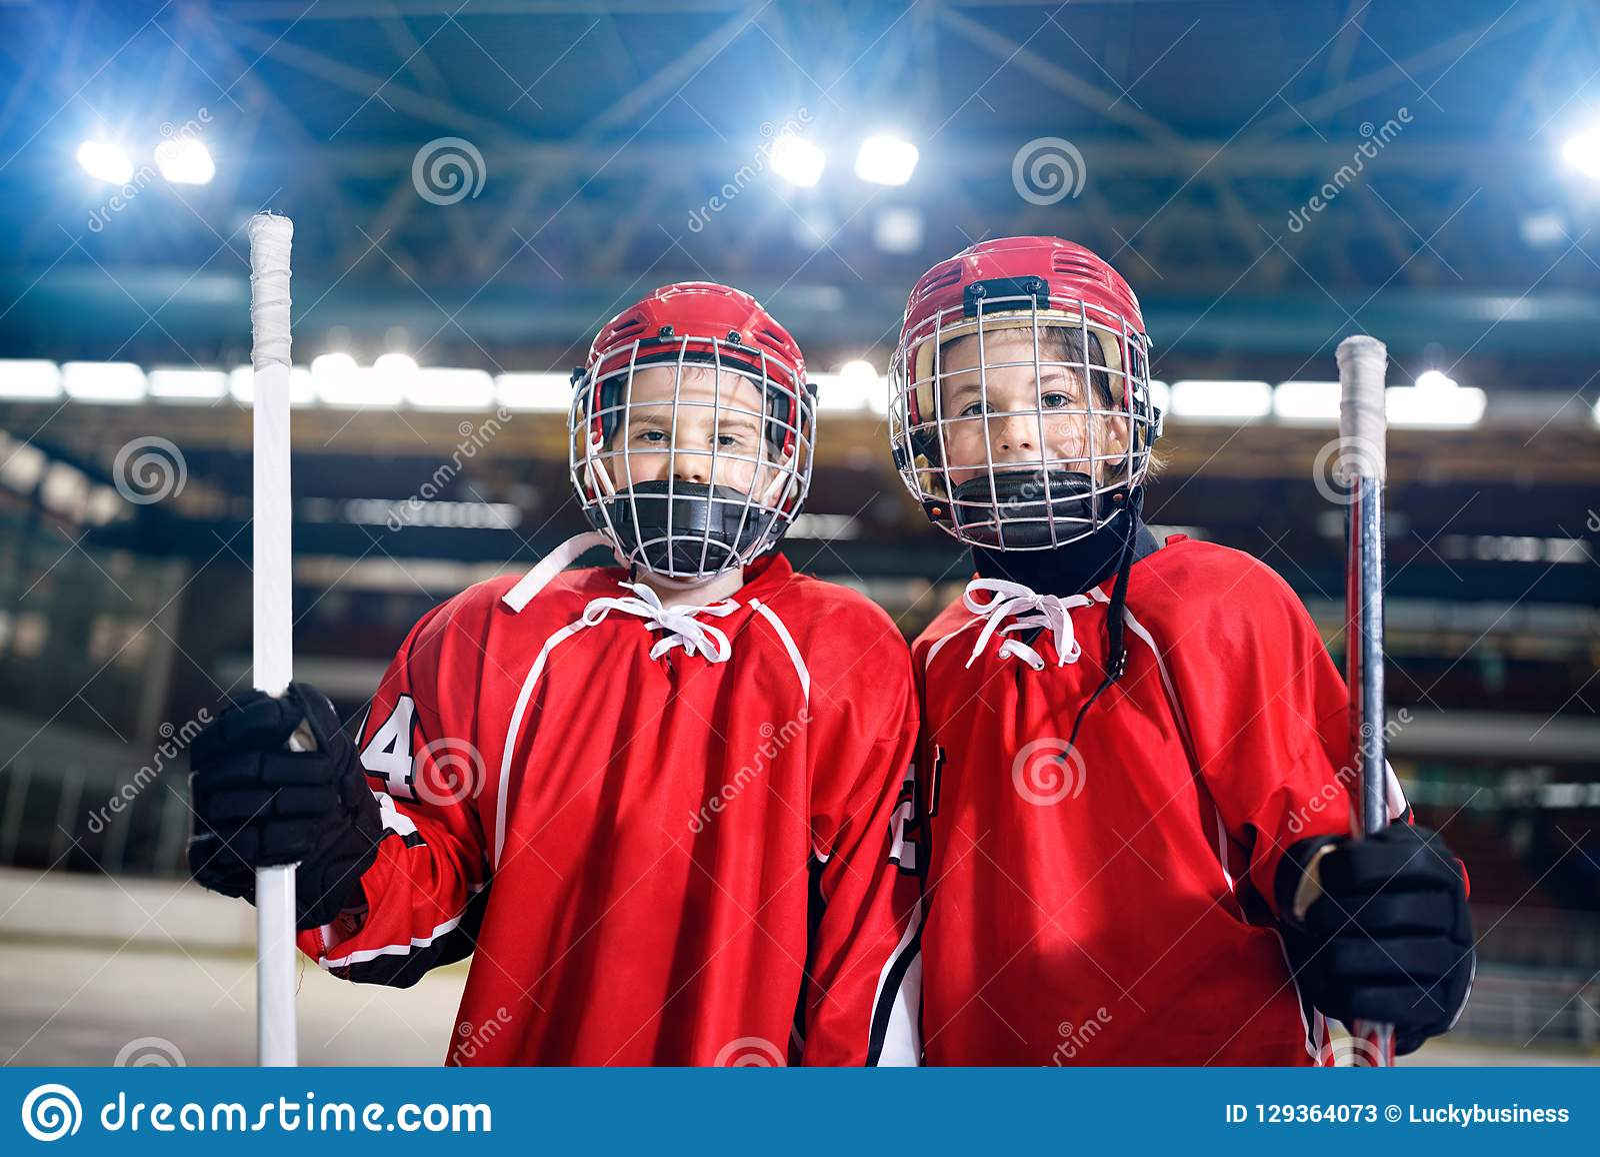 Ice Hockey - portrait boys players